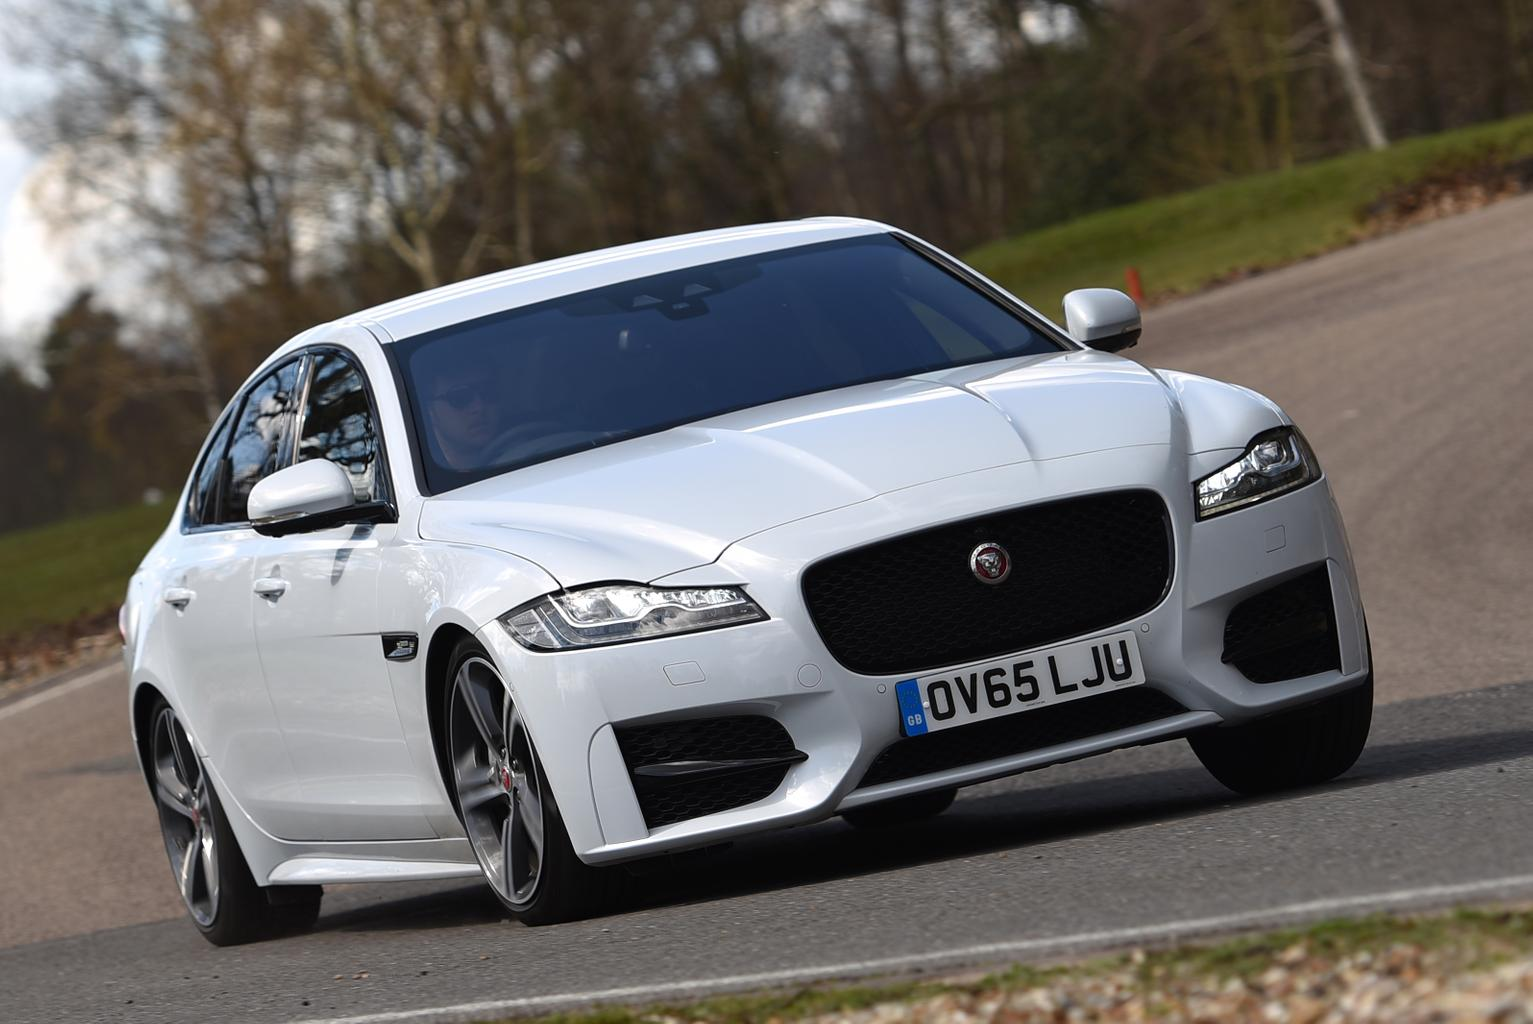 Best car deals for less than £600 per month